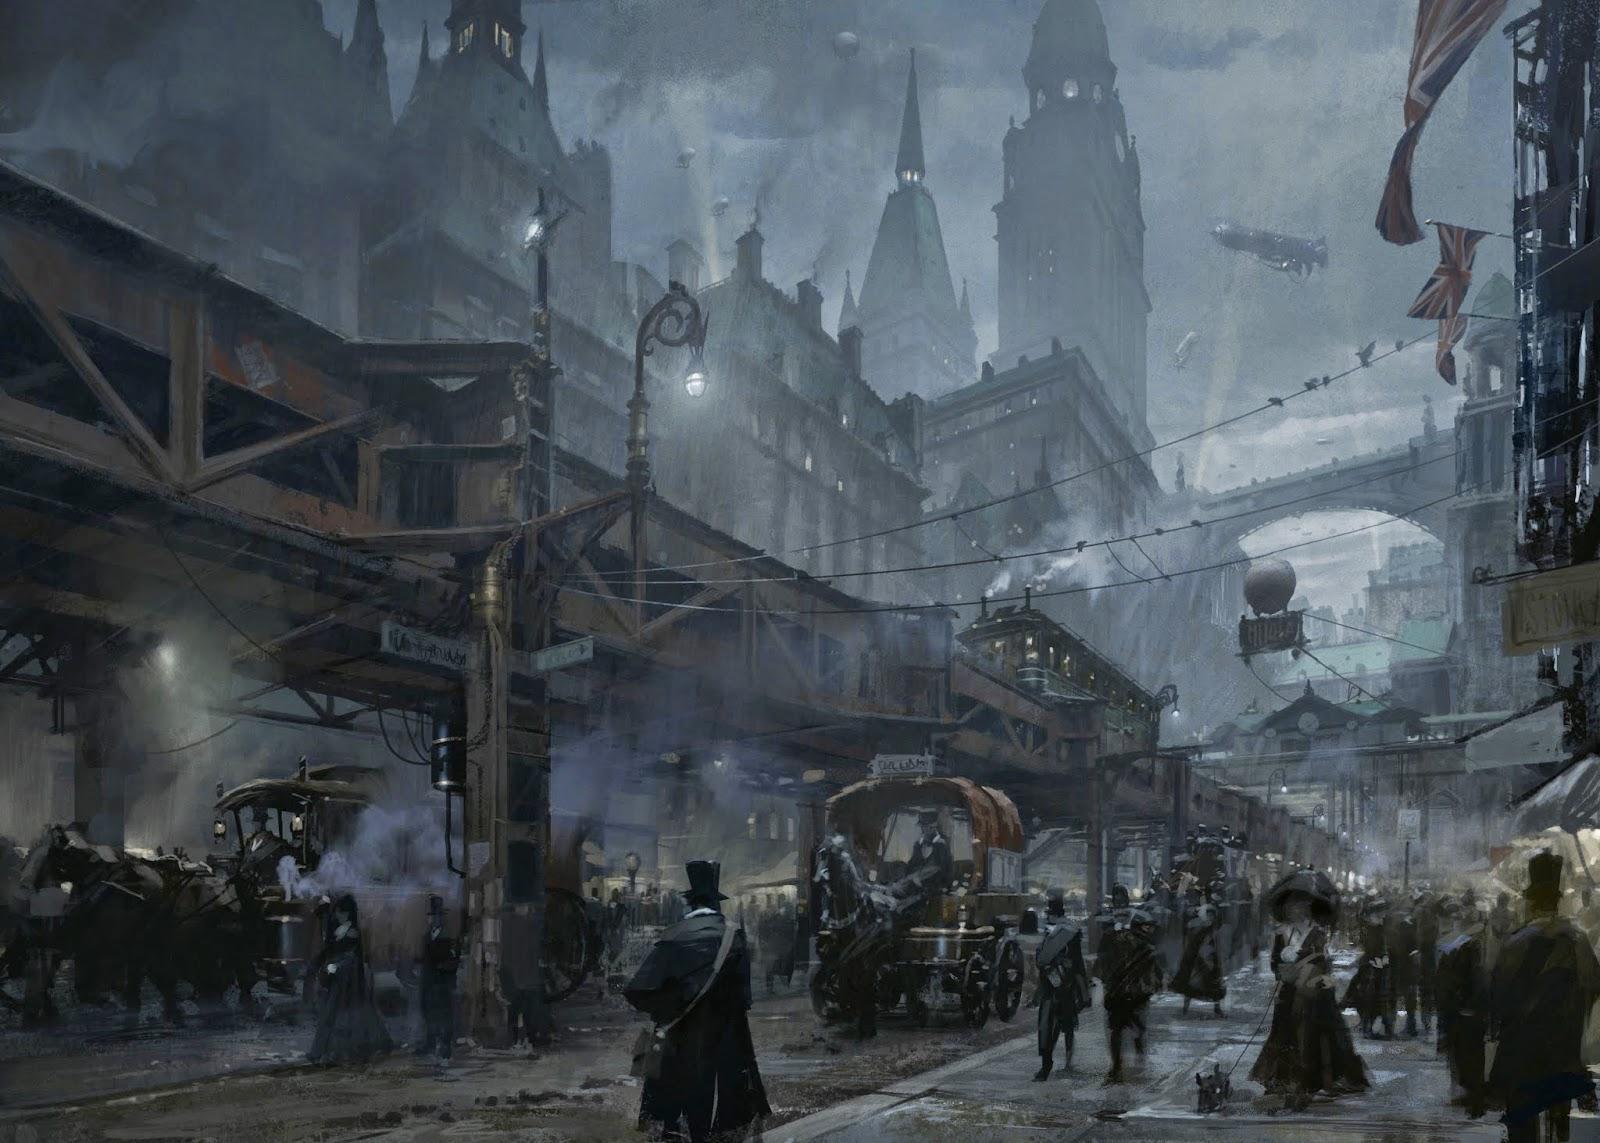 Tharn_Market_Street.jpg